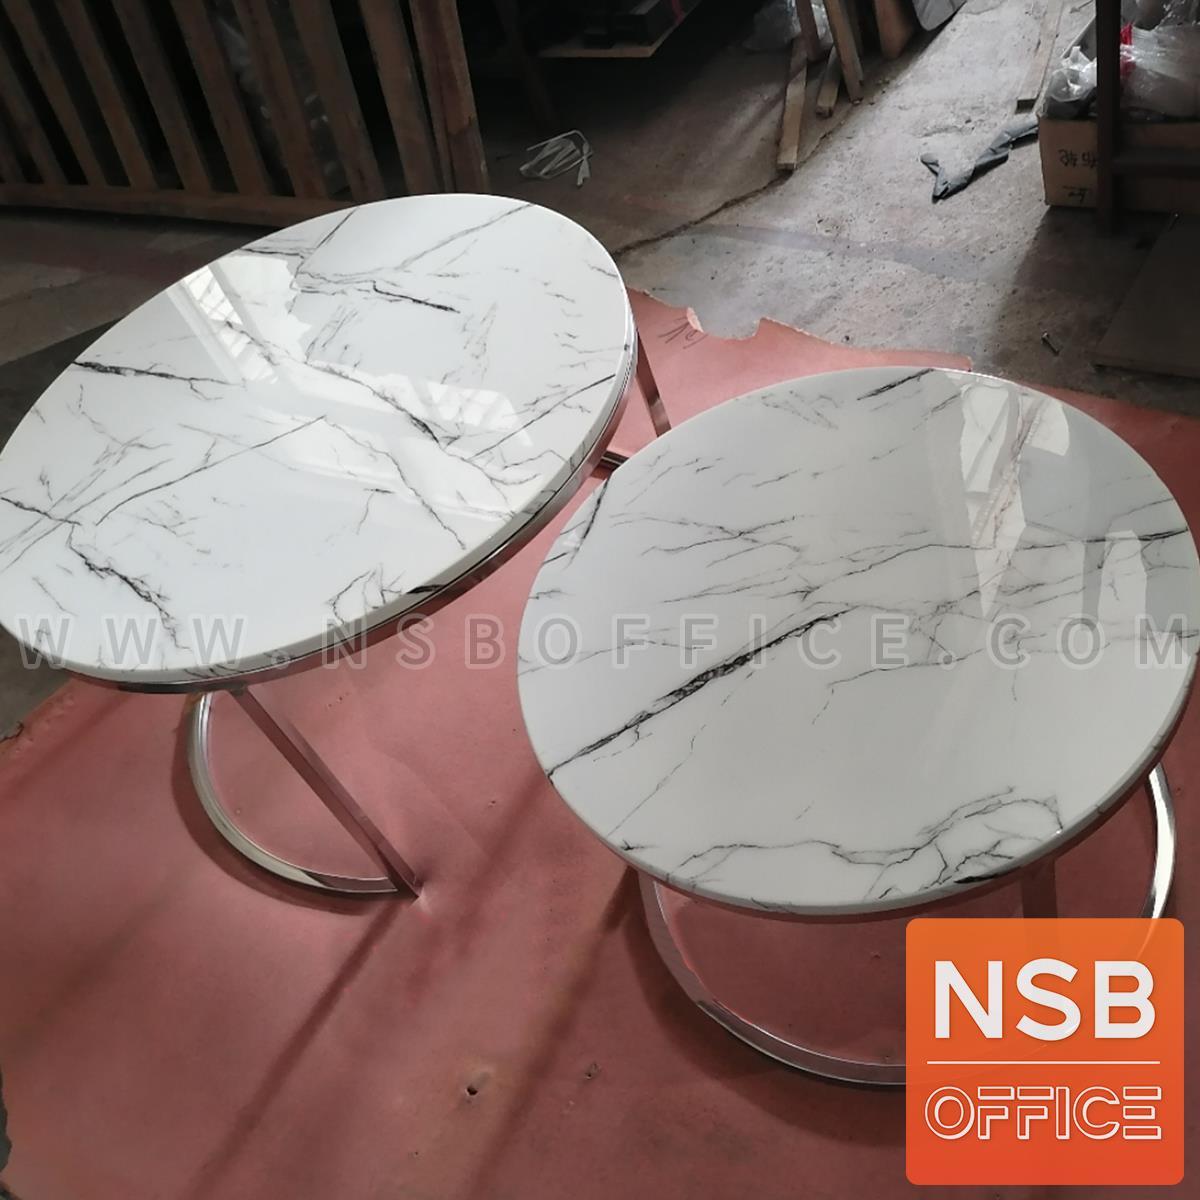 B13A302:โต๊ะกลางหินอ่อนสีขาว รุ่น Lightup (ไลท์อัพ)  ขาสแตนเลสเงิน